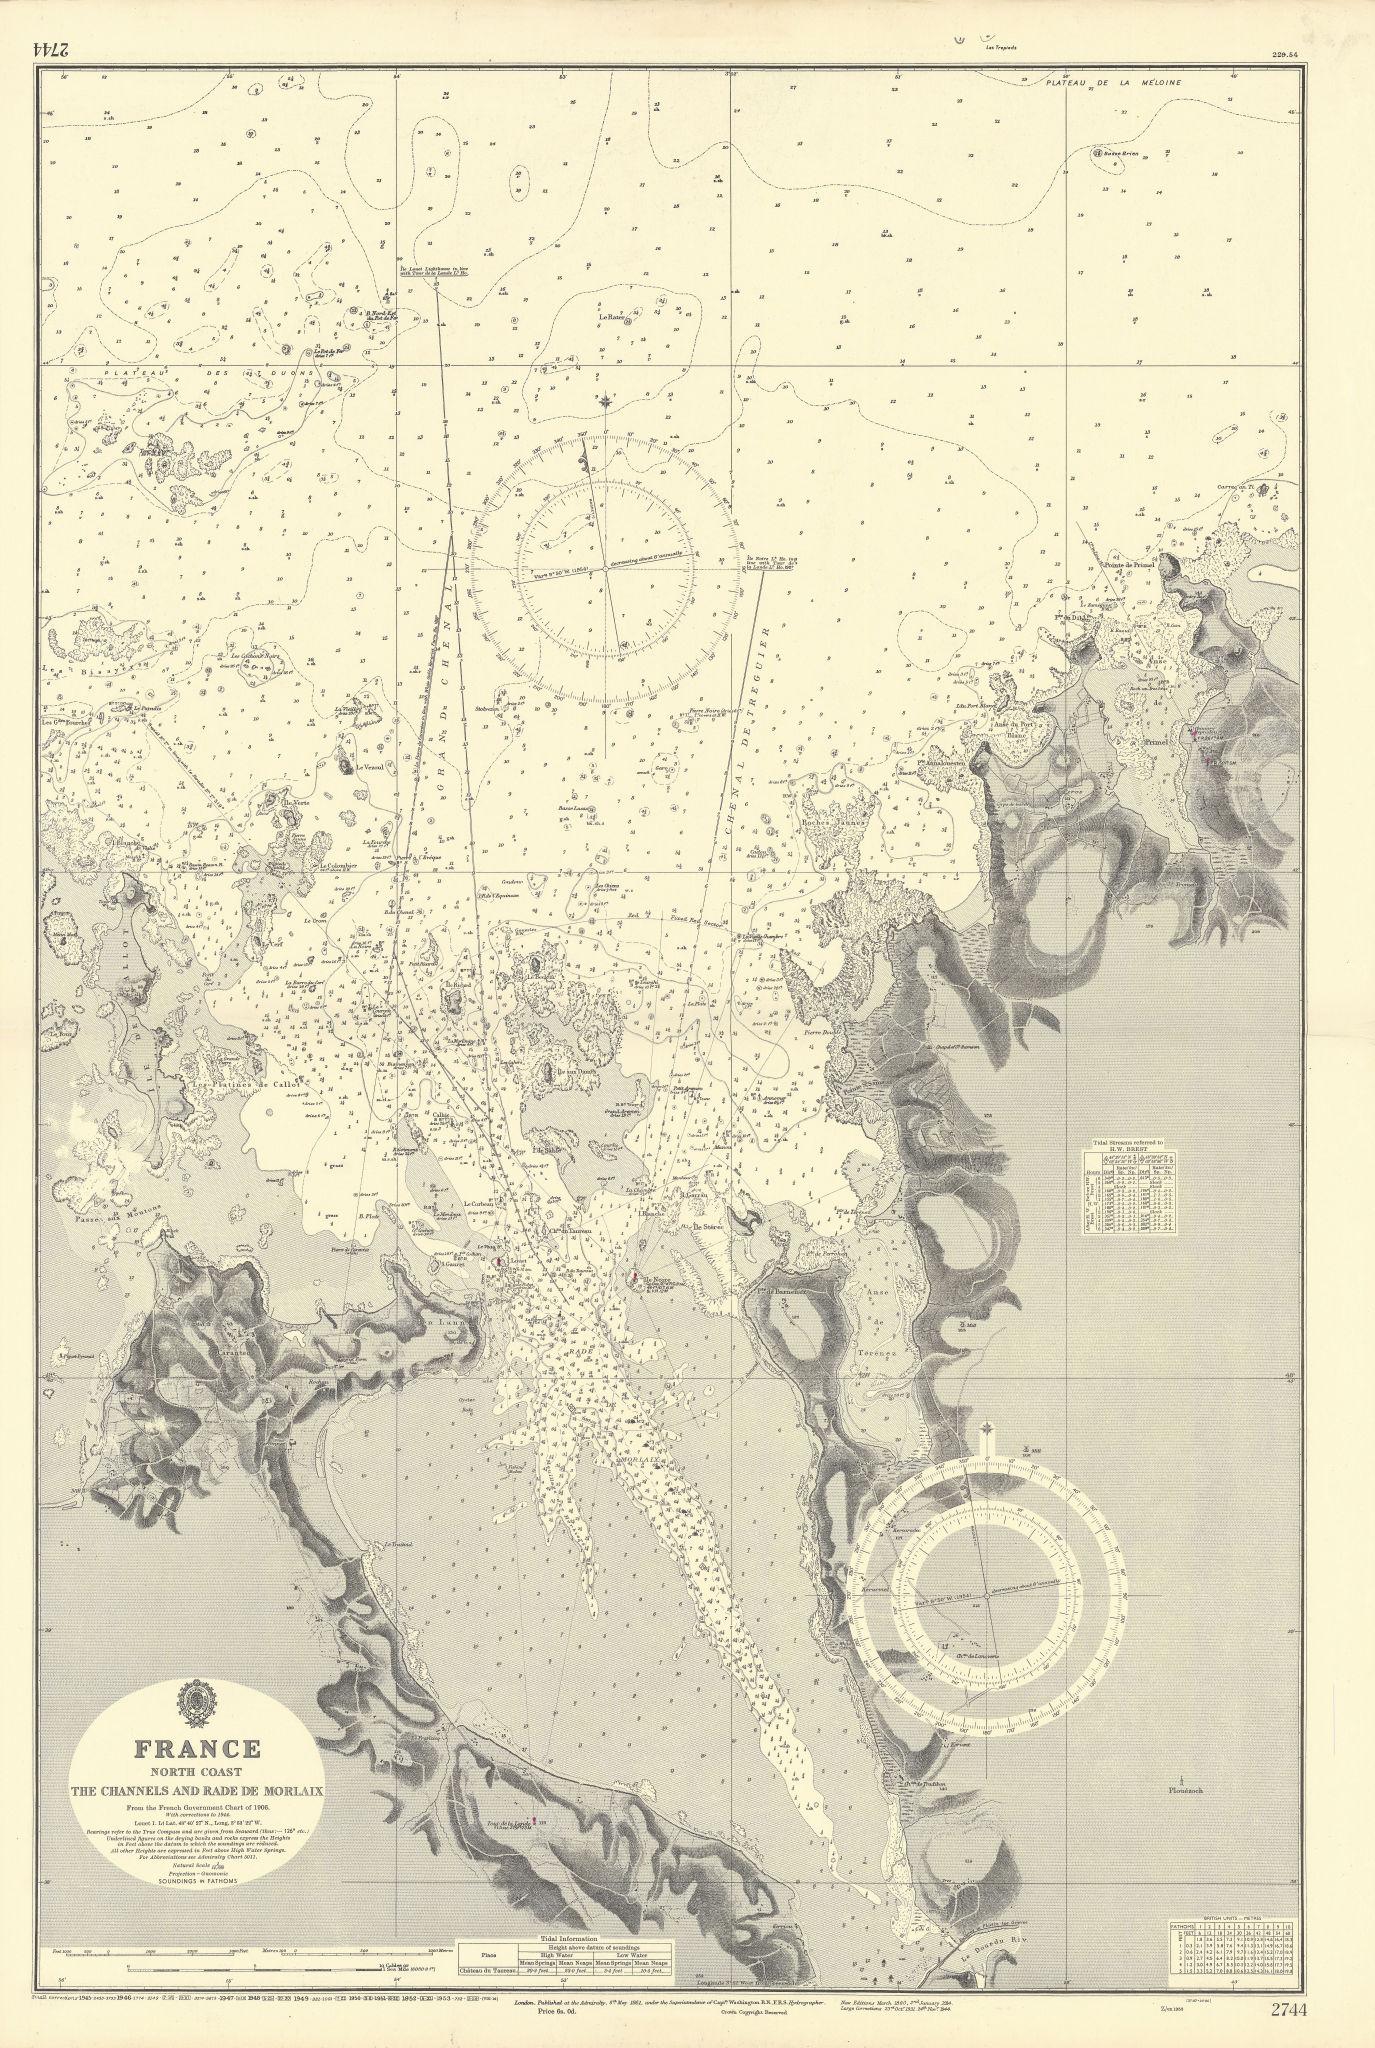 Channels & Rade de Morlaix. Finistère France ADMIRALTY sea chart 1861 (1953) map